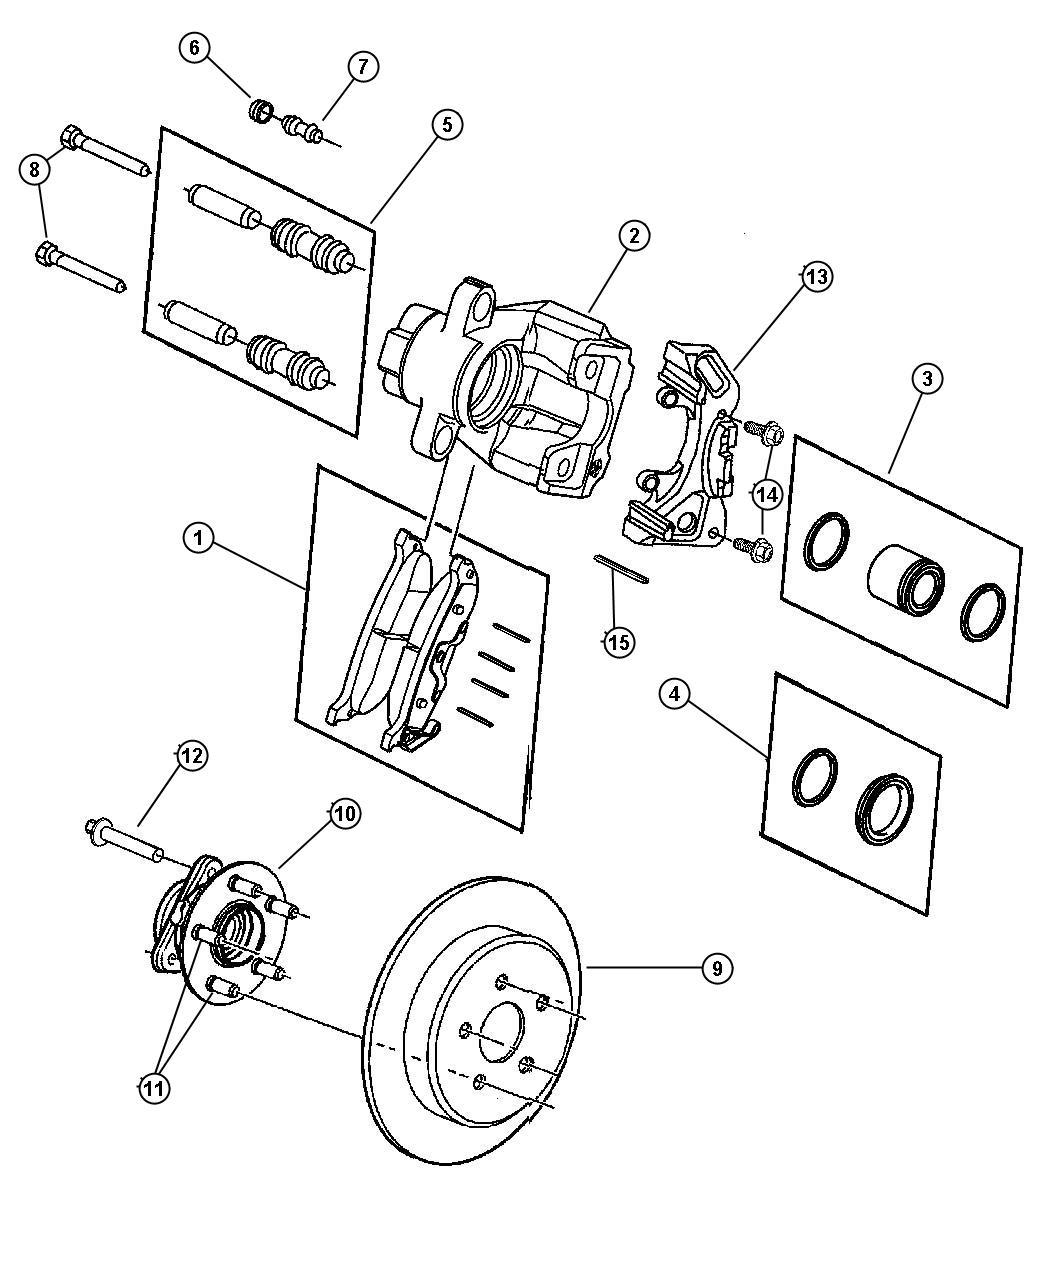 2011 dodge caliber pad kit  rear disc brake  contains